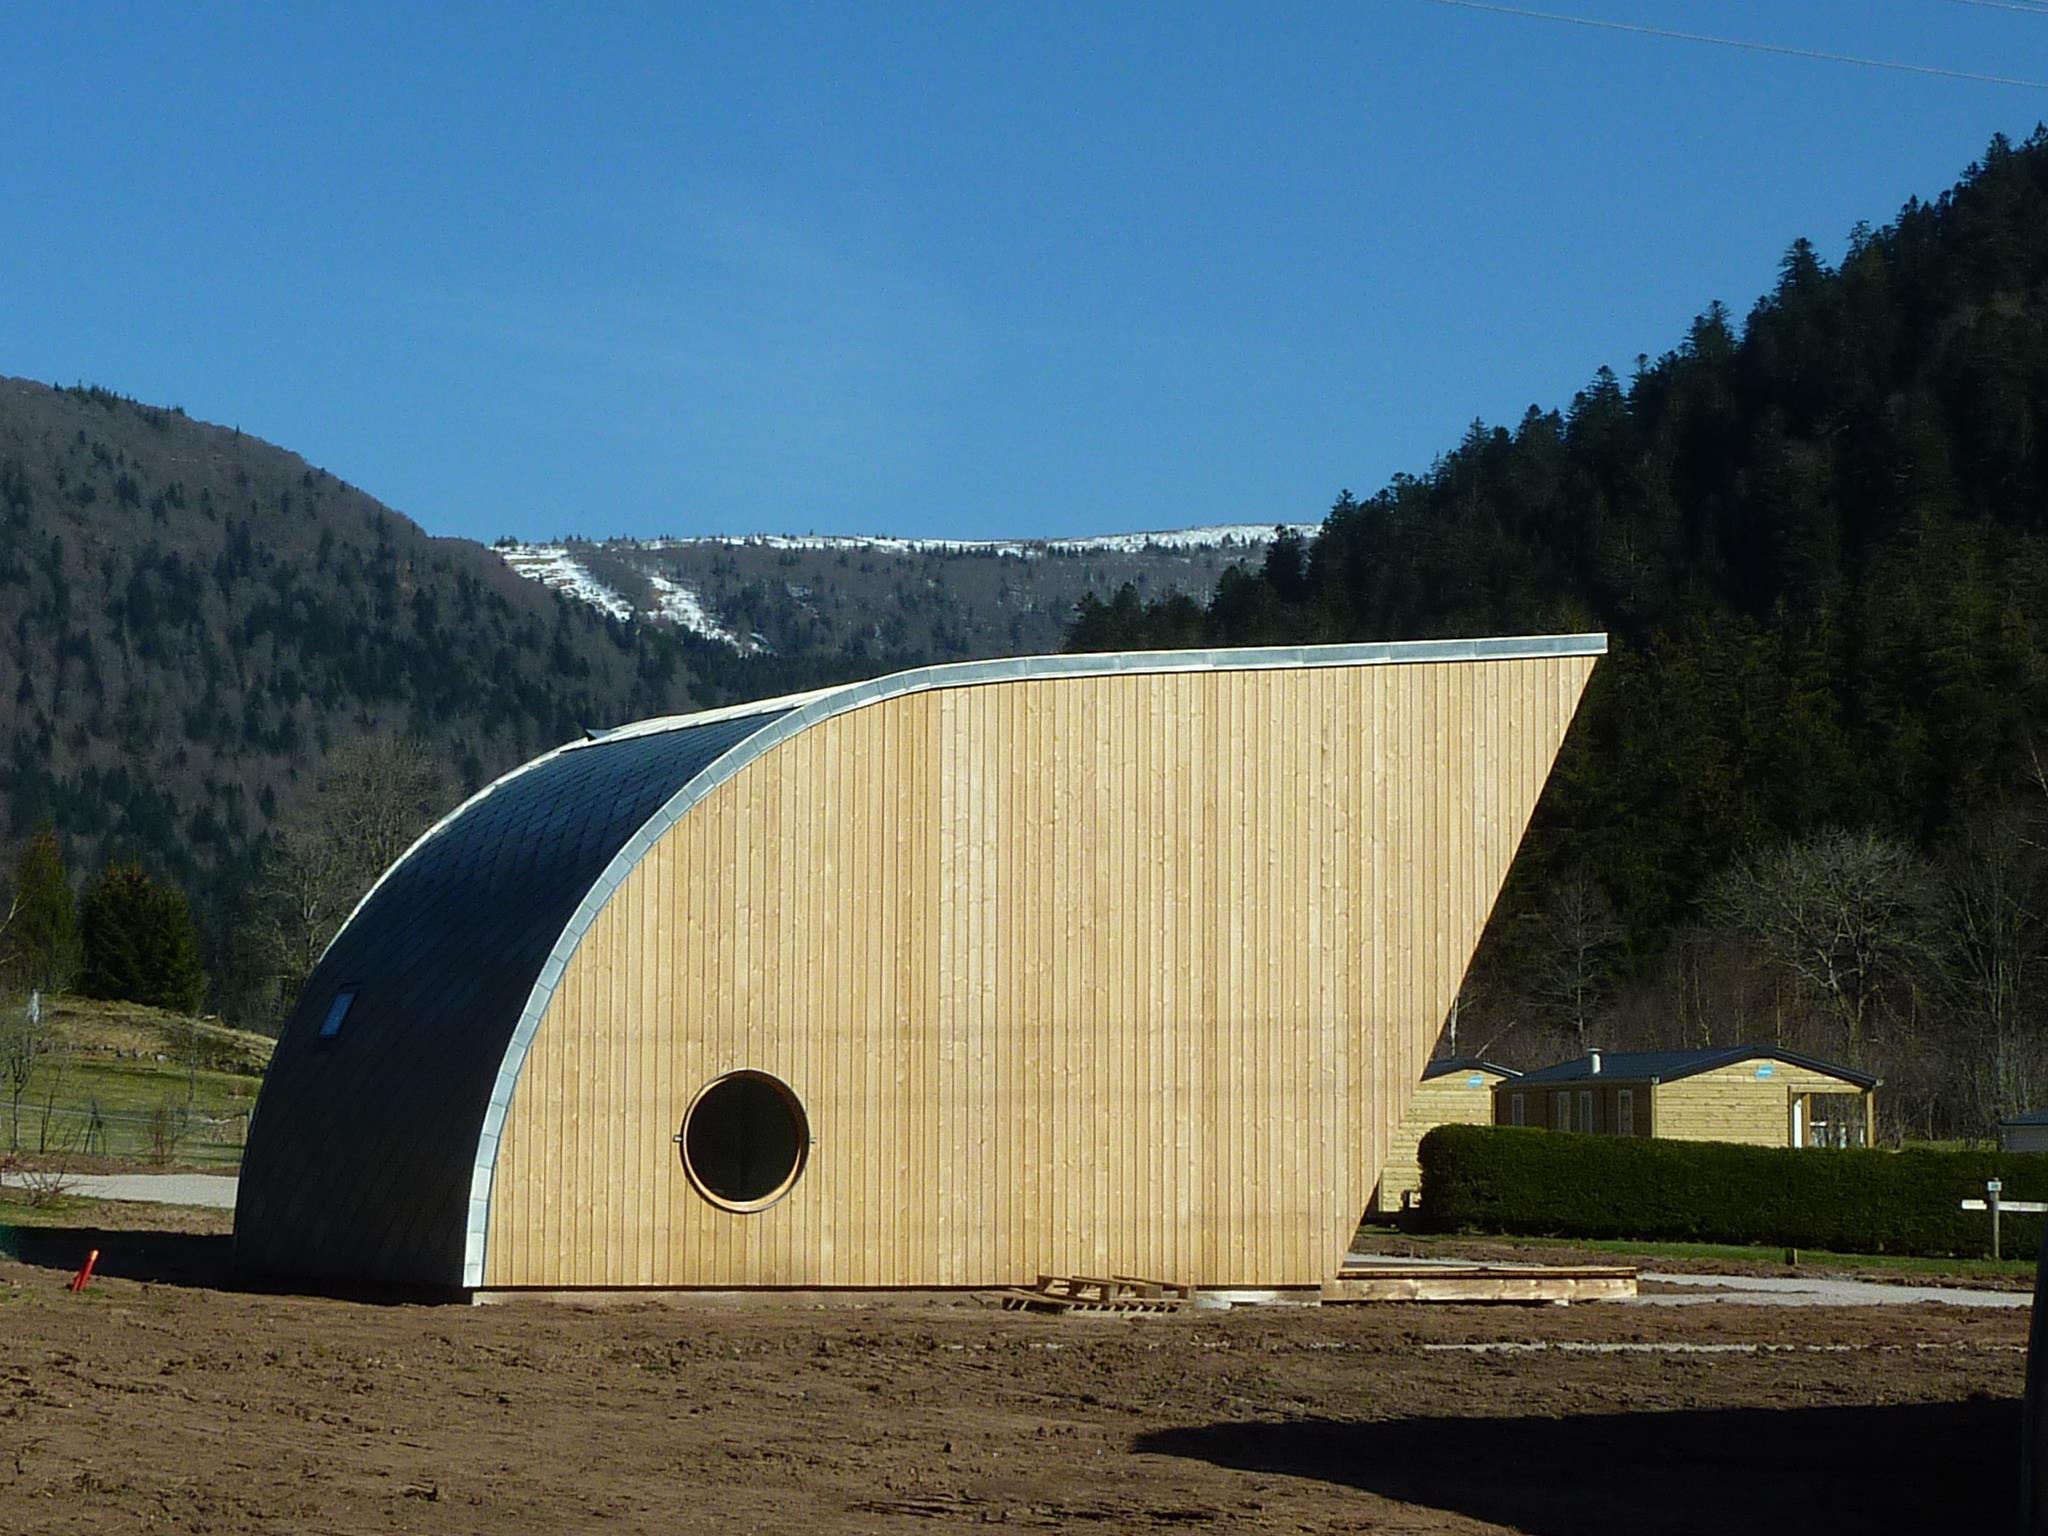 Location - Premium Chalet Eco-Lodge Bi Famille 42M² X 2 + Terrasse - 2015 - Flower Camping Verte Vallee